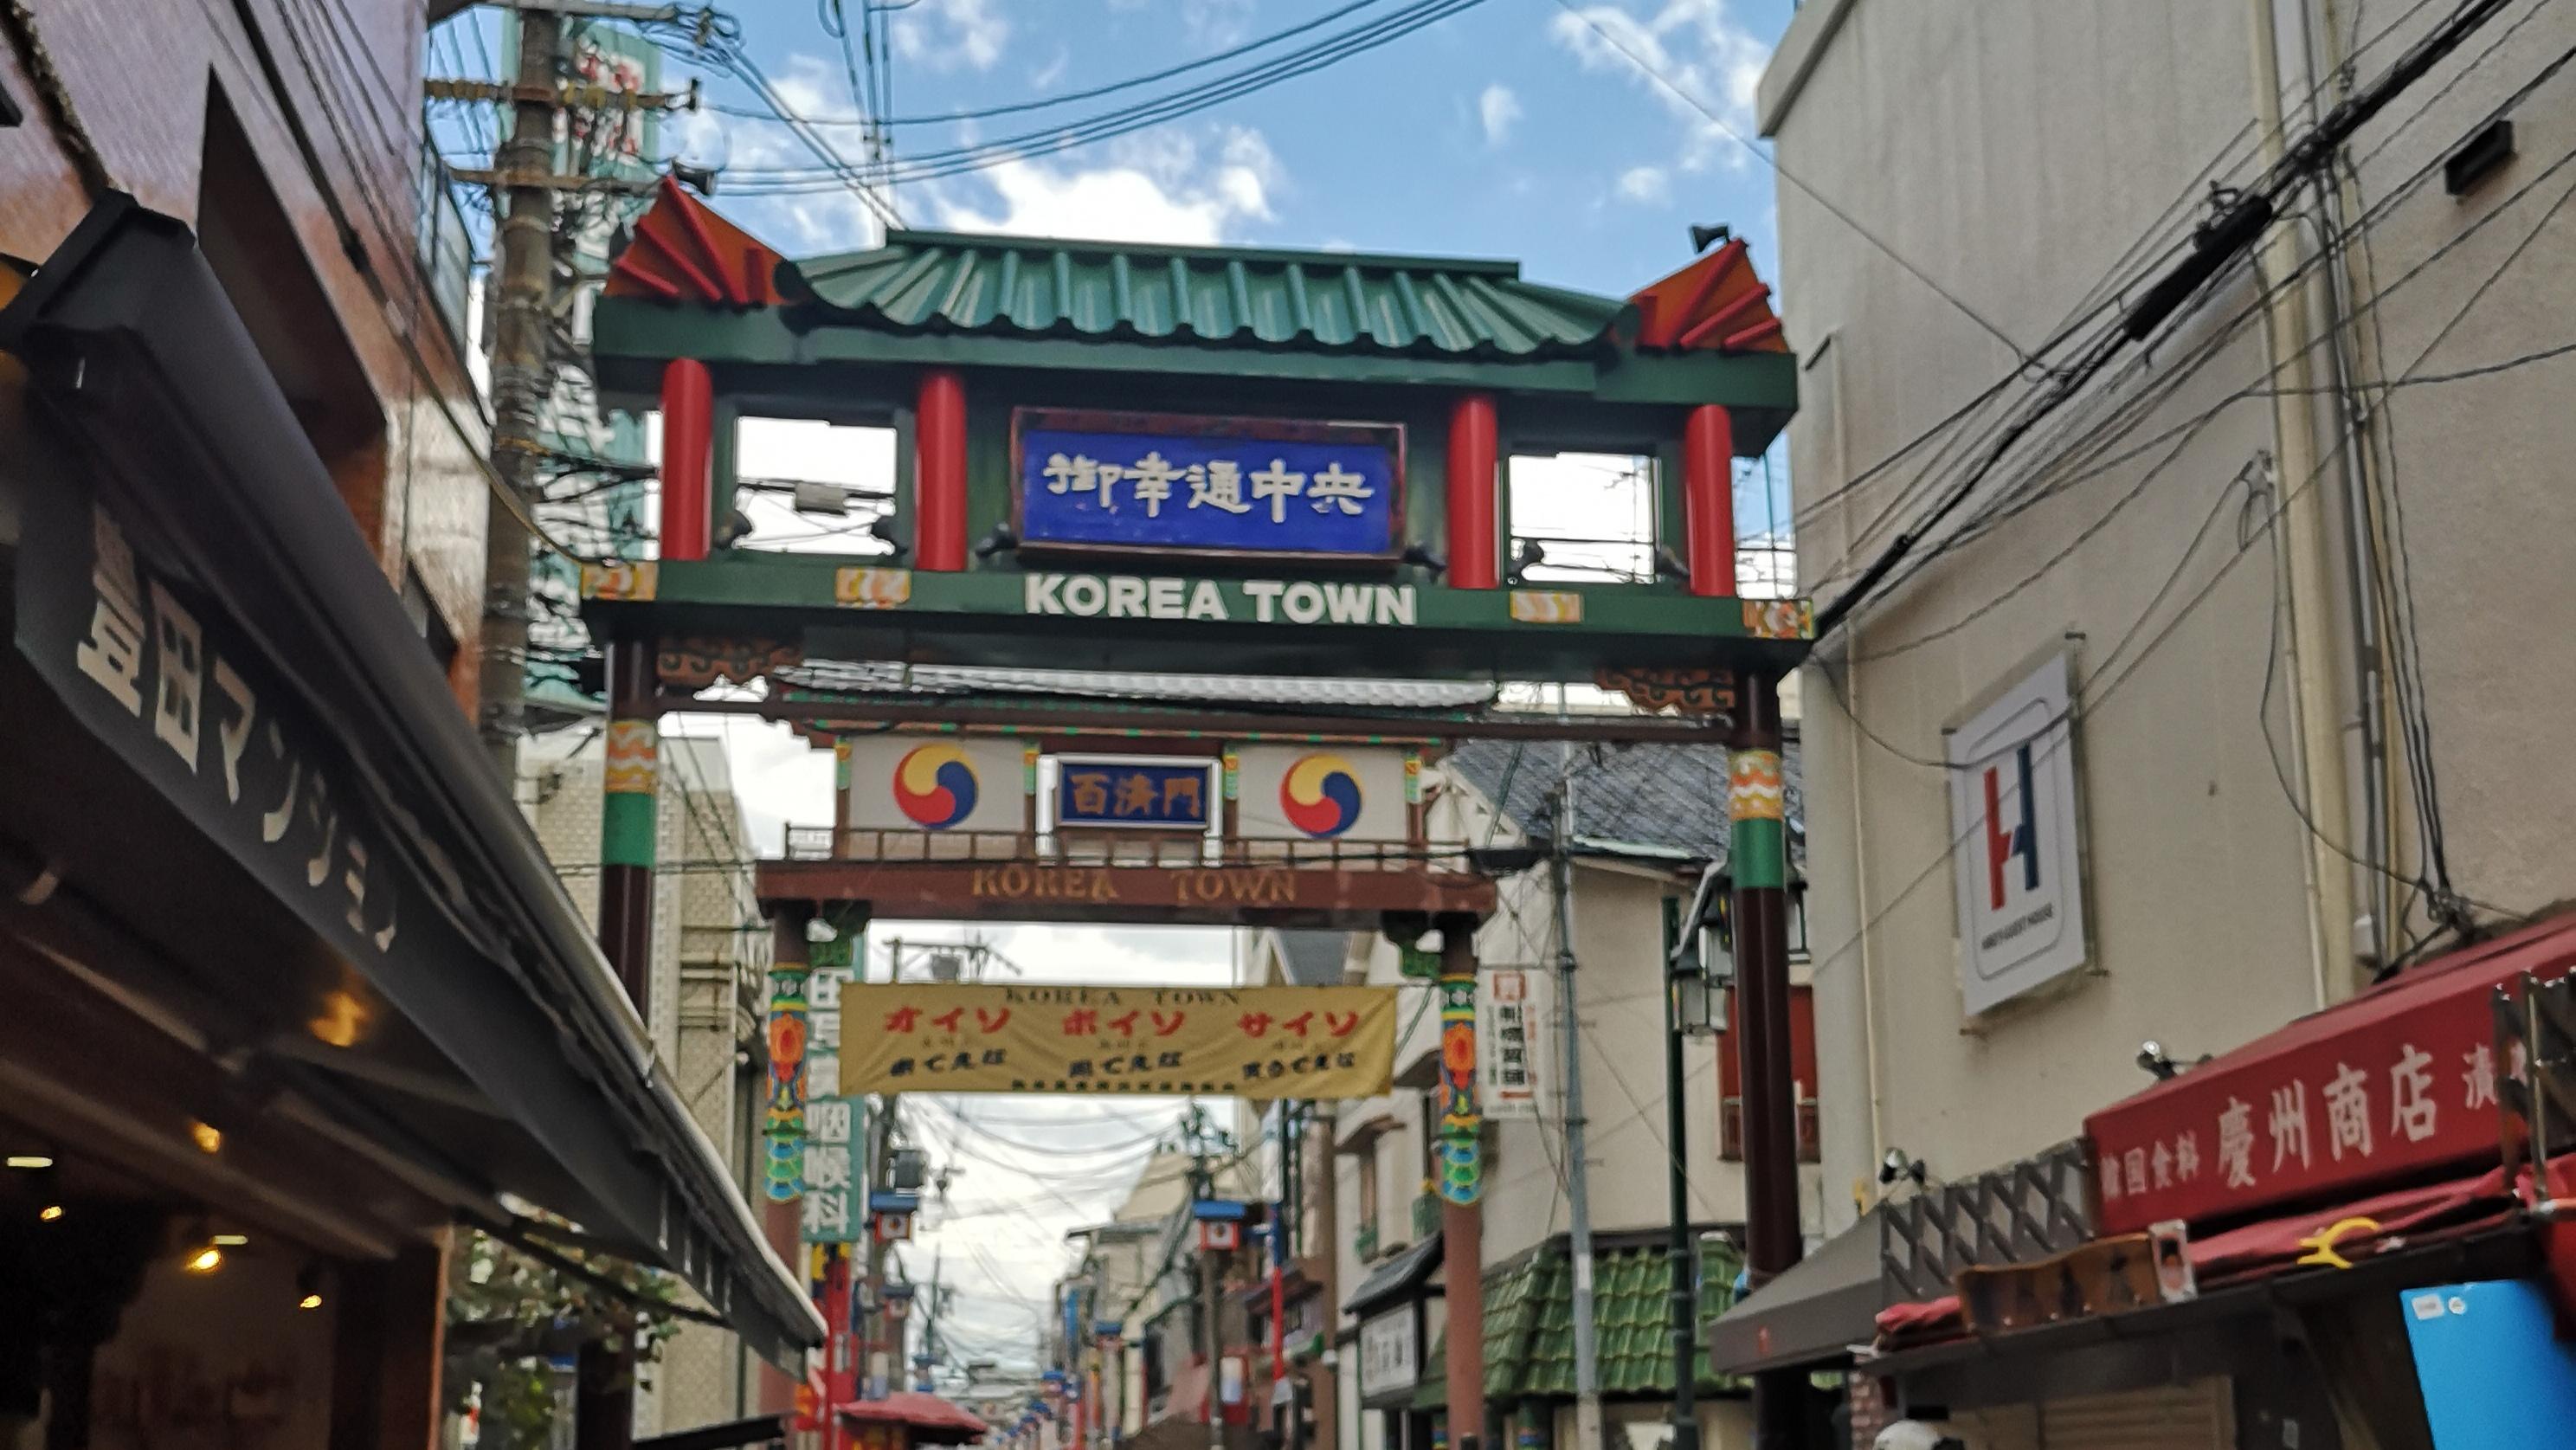 Finding Korea in Japan: Exploring Osaka's Ikuno Korea Town